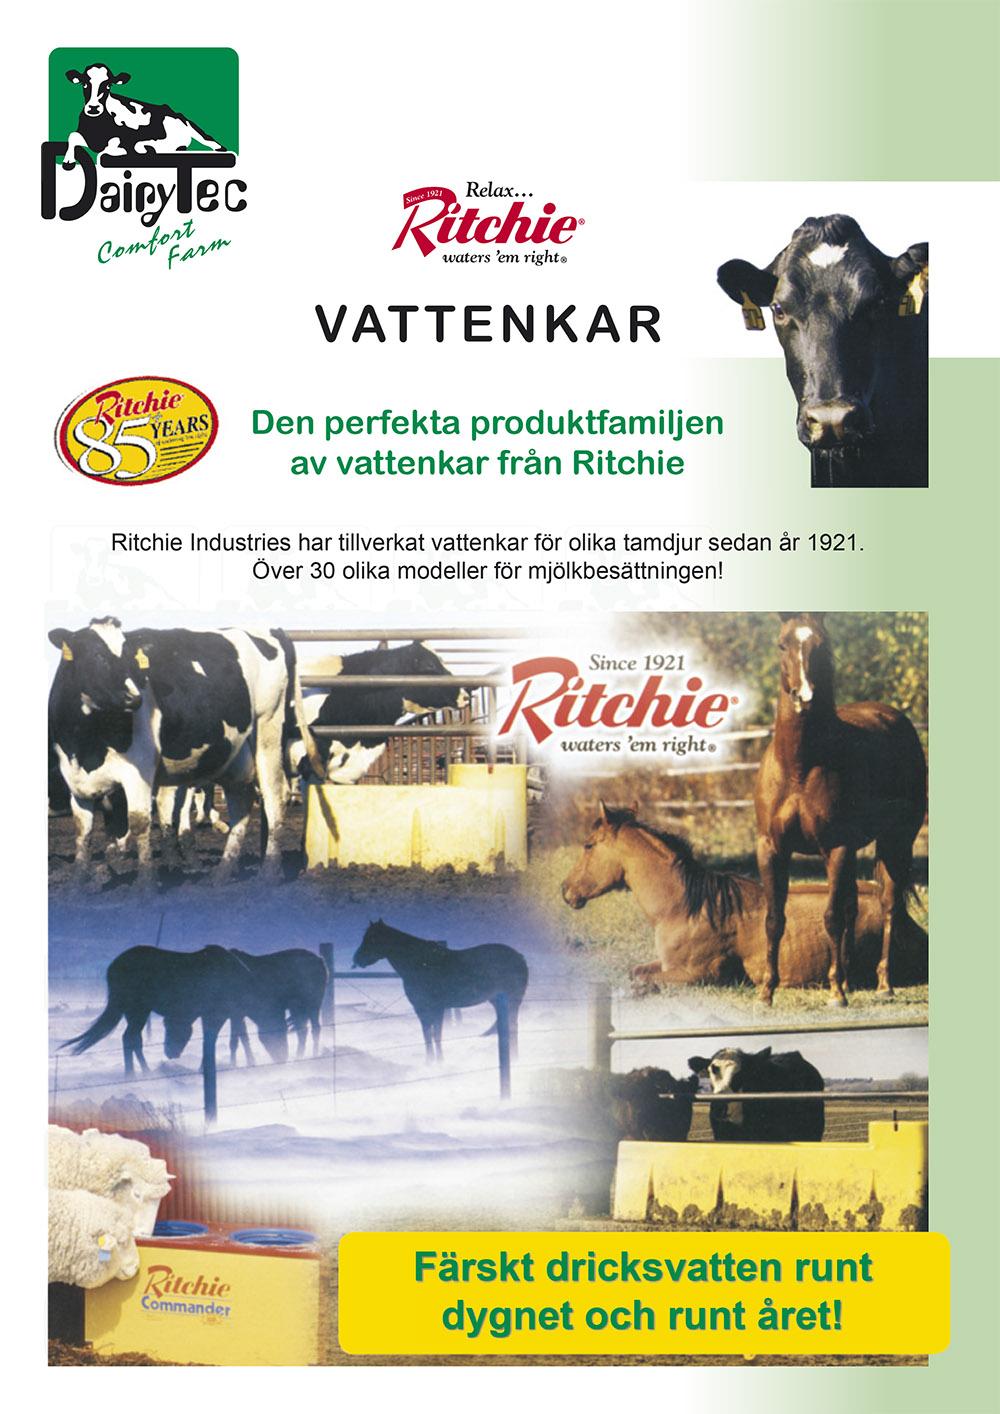 Vattenkar_SWE_veeb-1